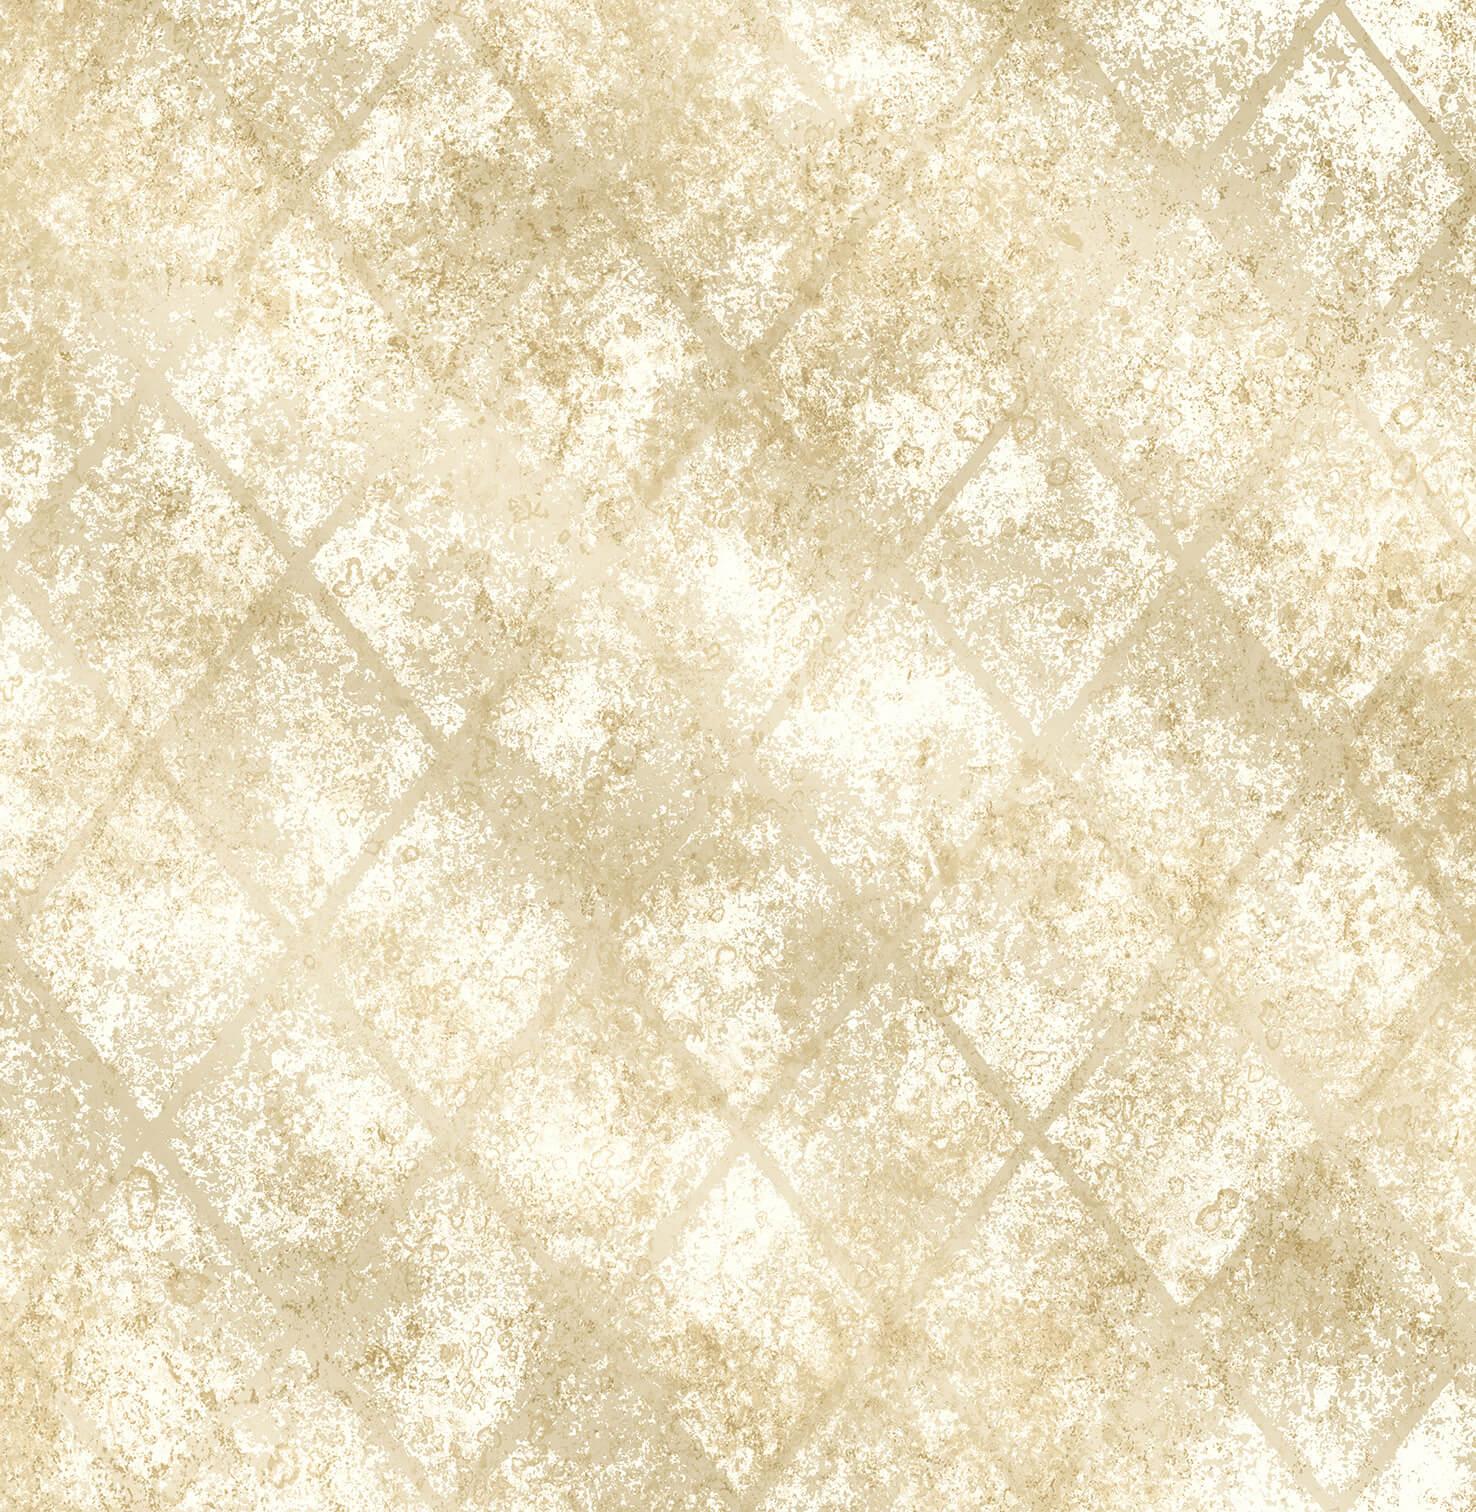 Metallwand Rasch Textil Vliestapete Vintage Look Tapeten Reclaimed  3 Farben